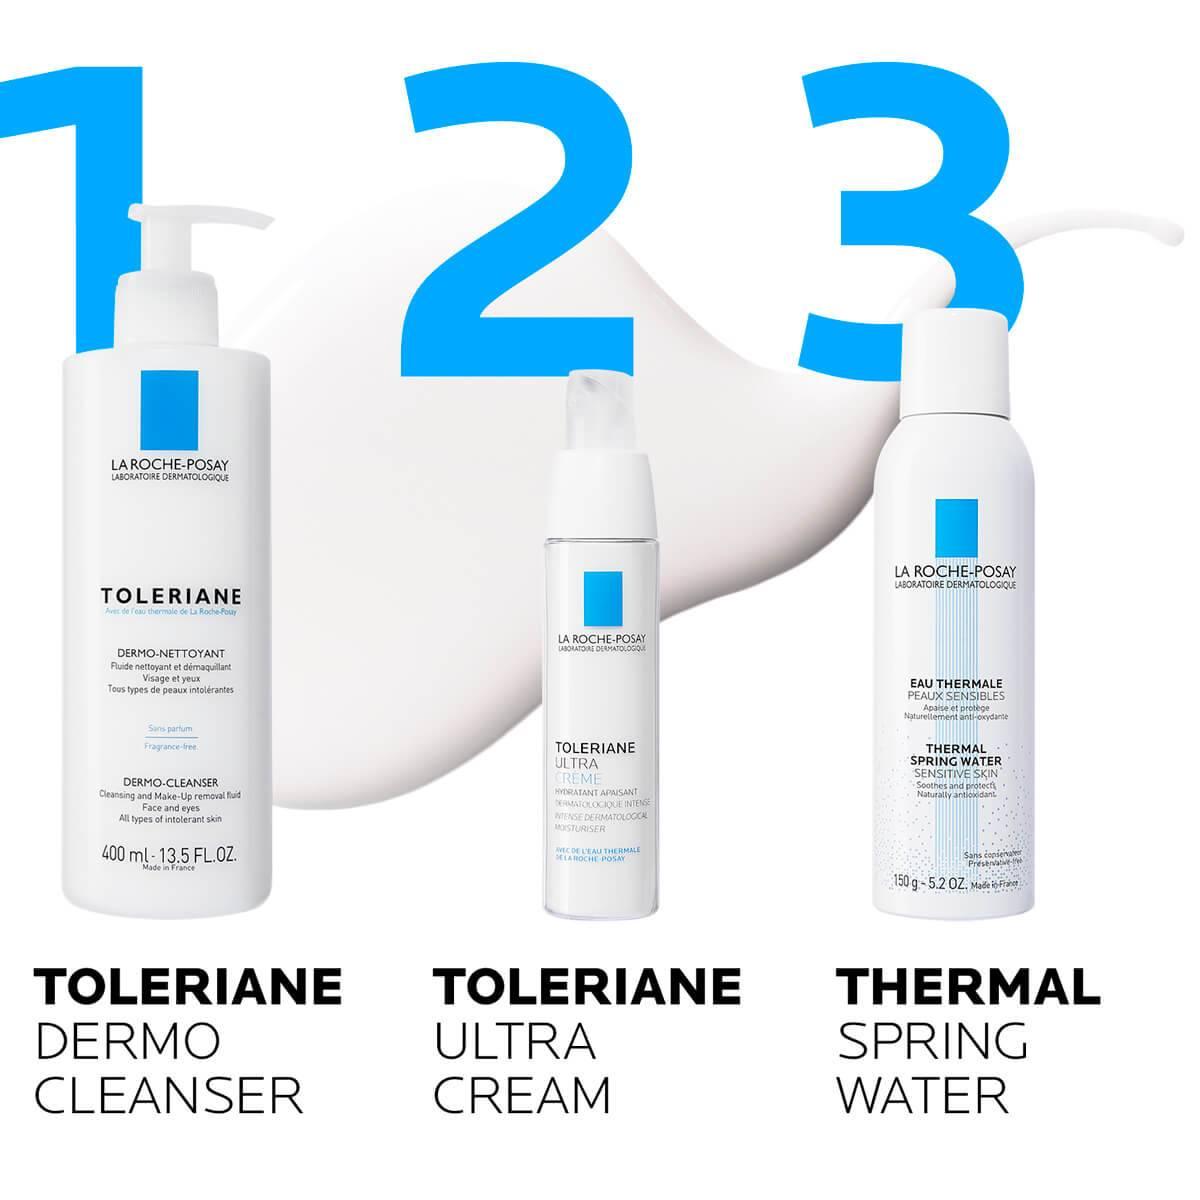 LaRochePosay-Produkt-Alergicka-Toleriane-DermoCleanser-400ml-3337872411830-Pravidelna